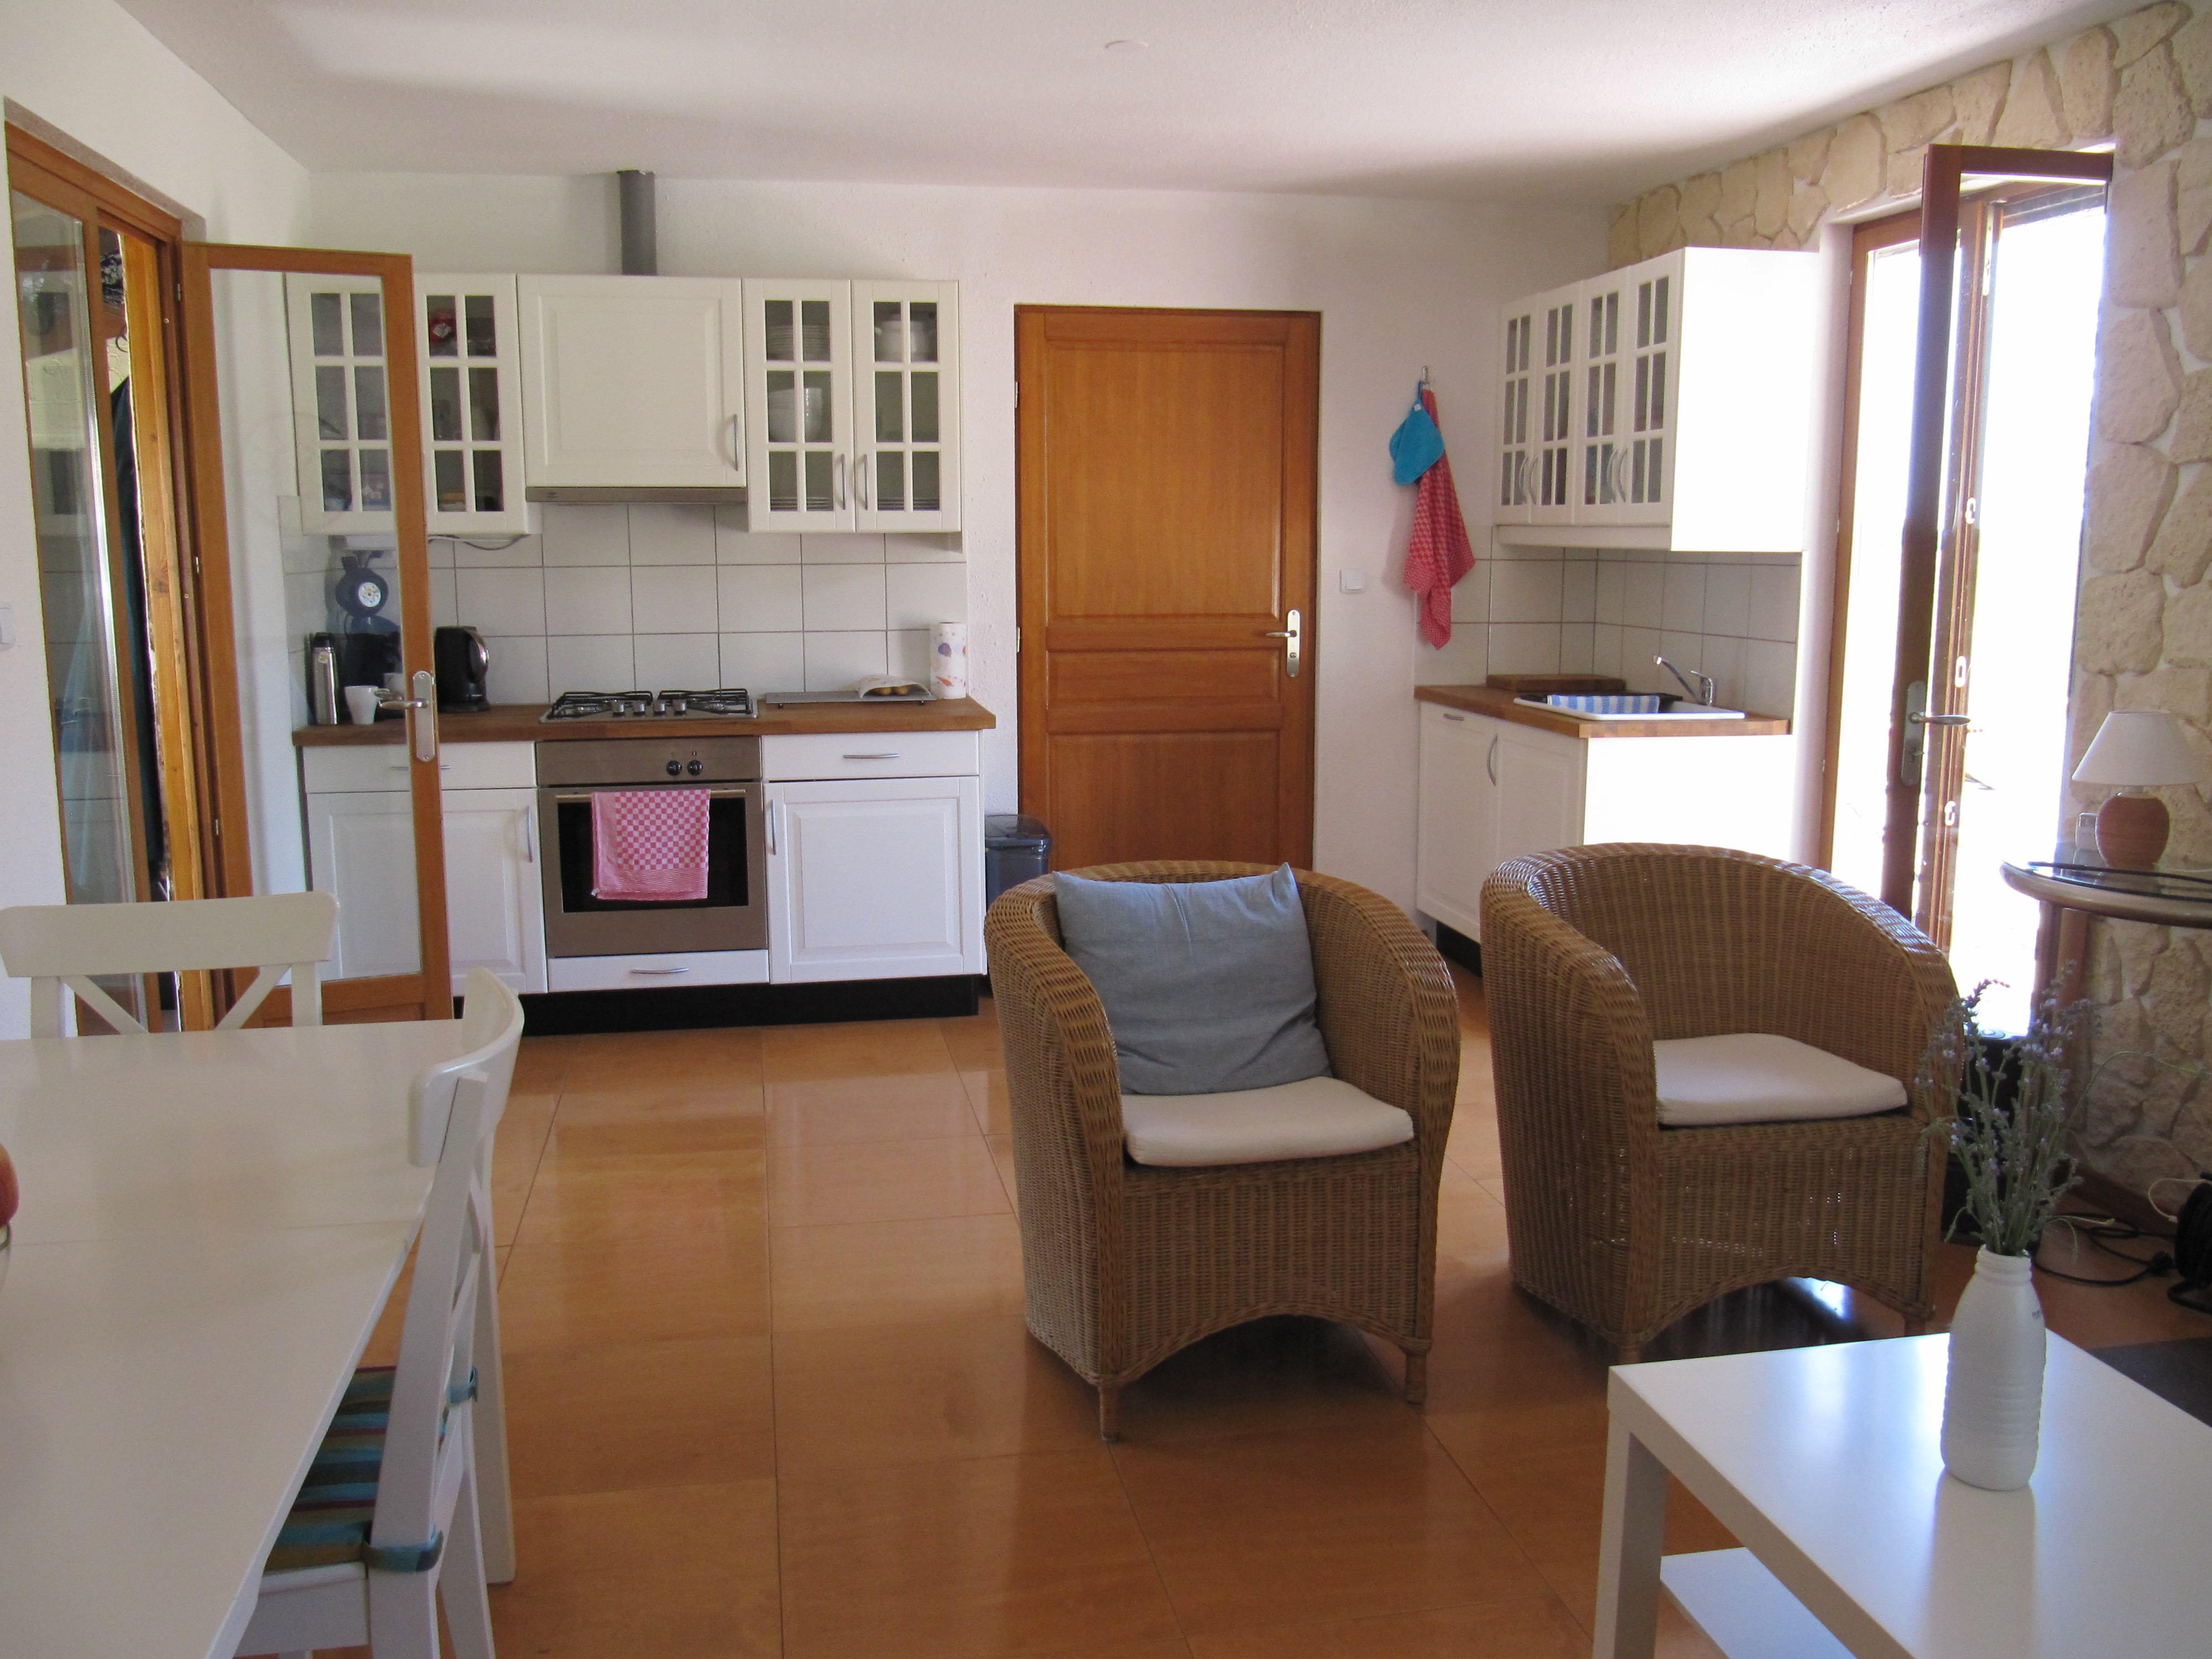 keukentje vanuit huiskamer